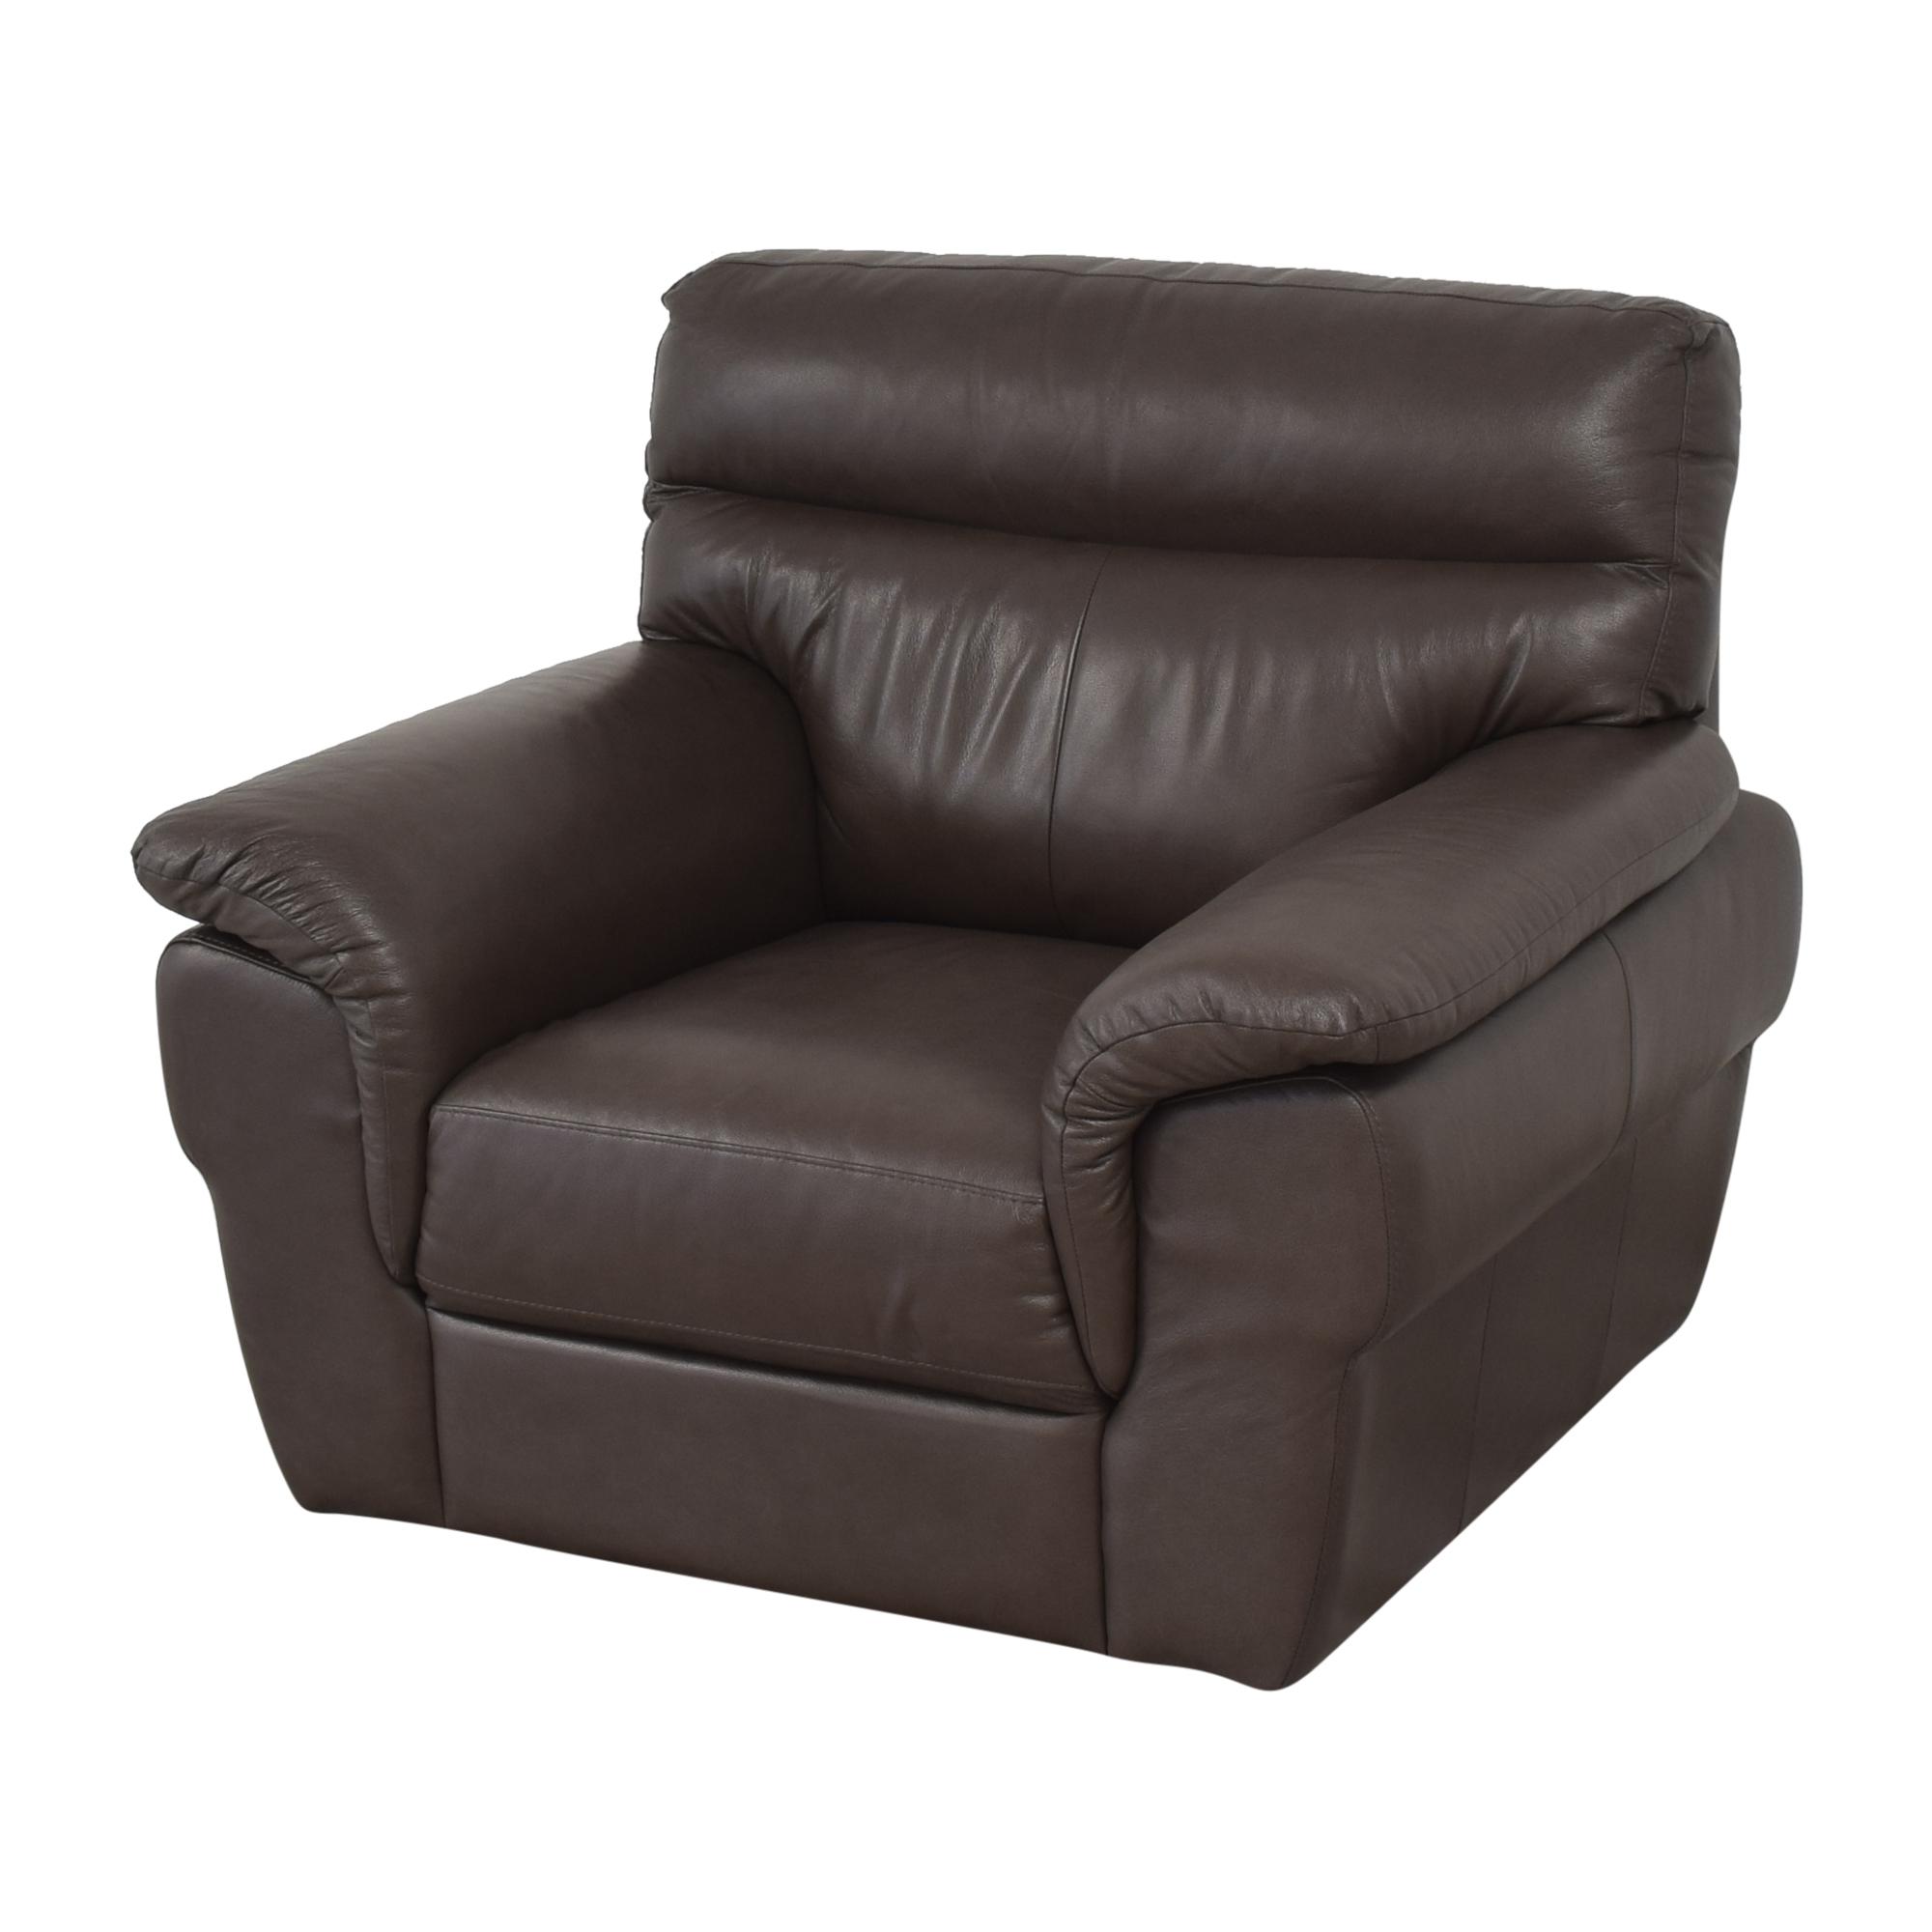 Raymour & Flanigan Raymour & Flanigan Luca Chair ct